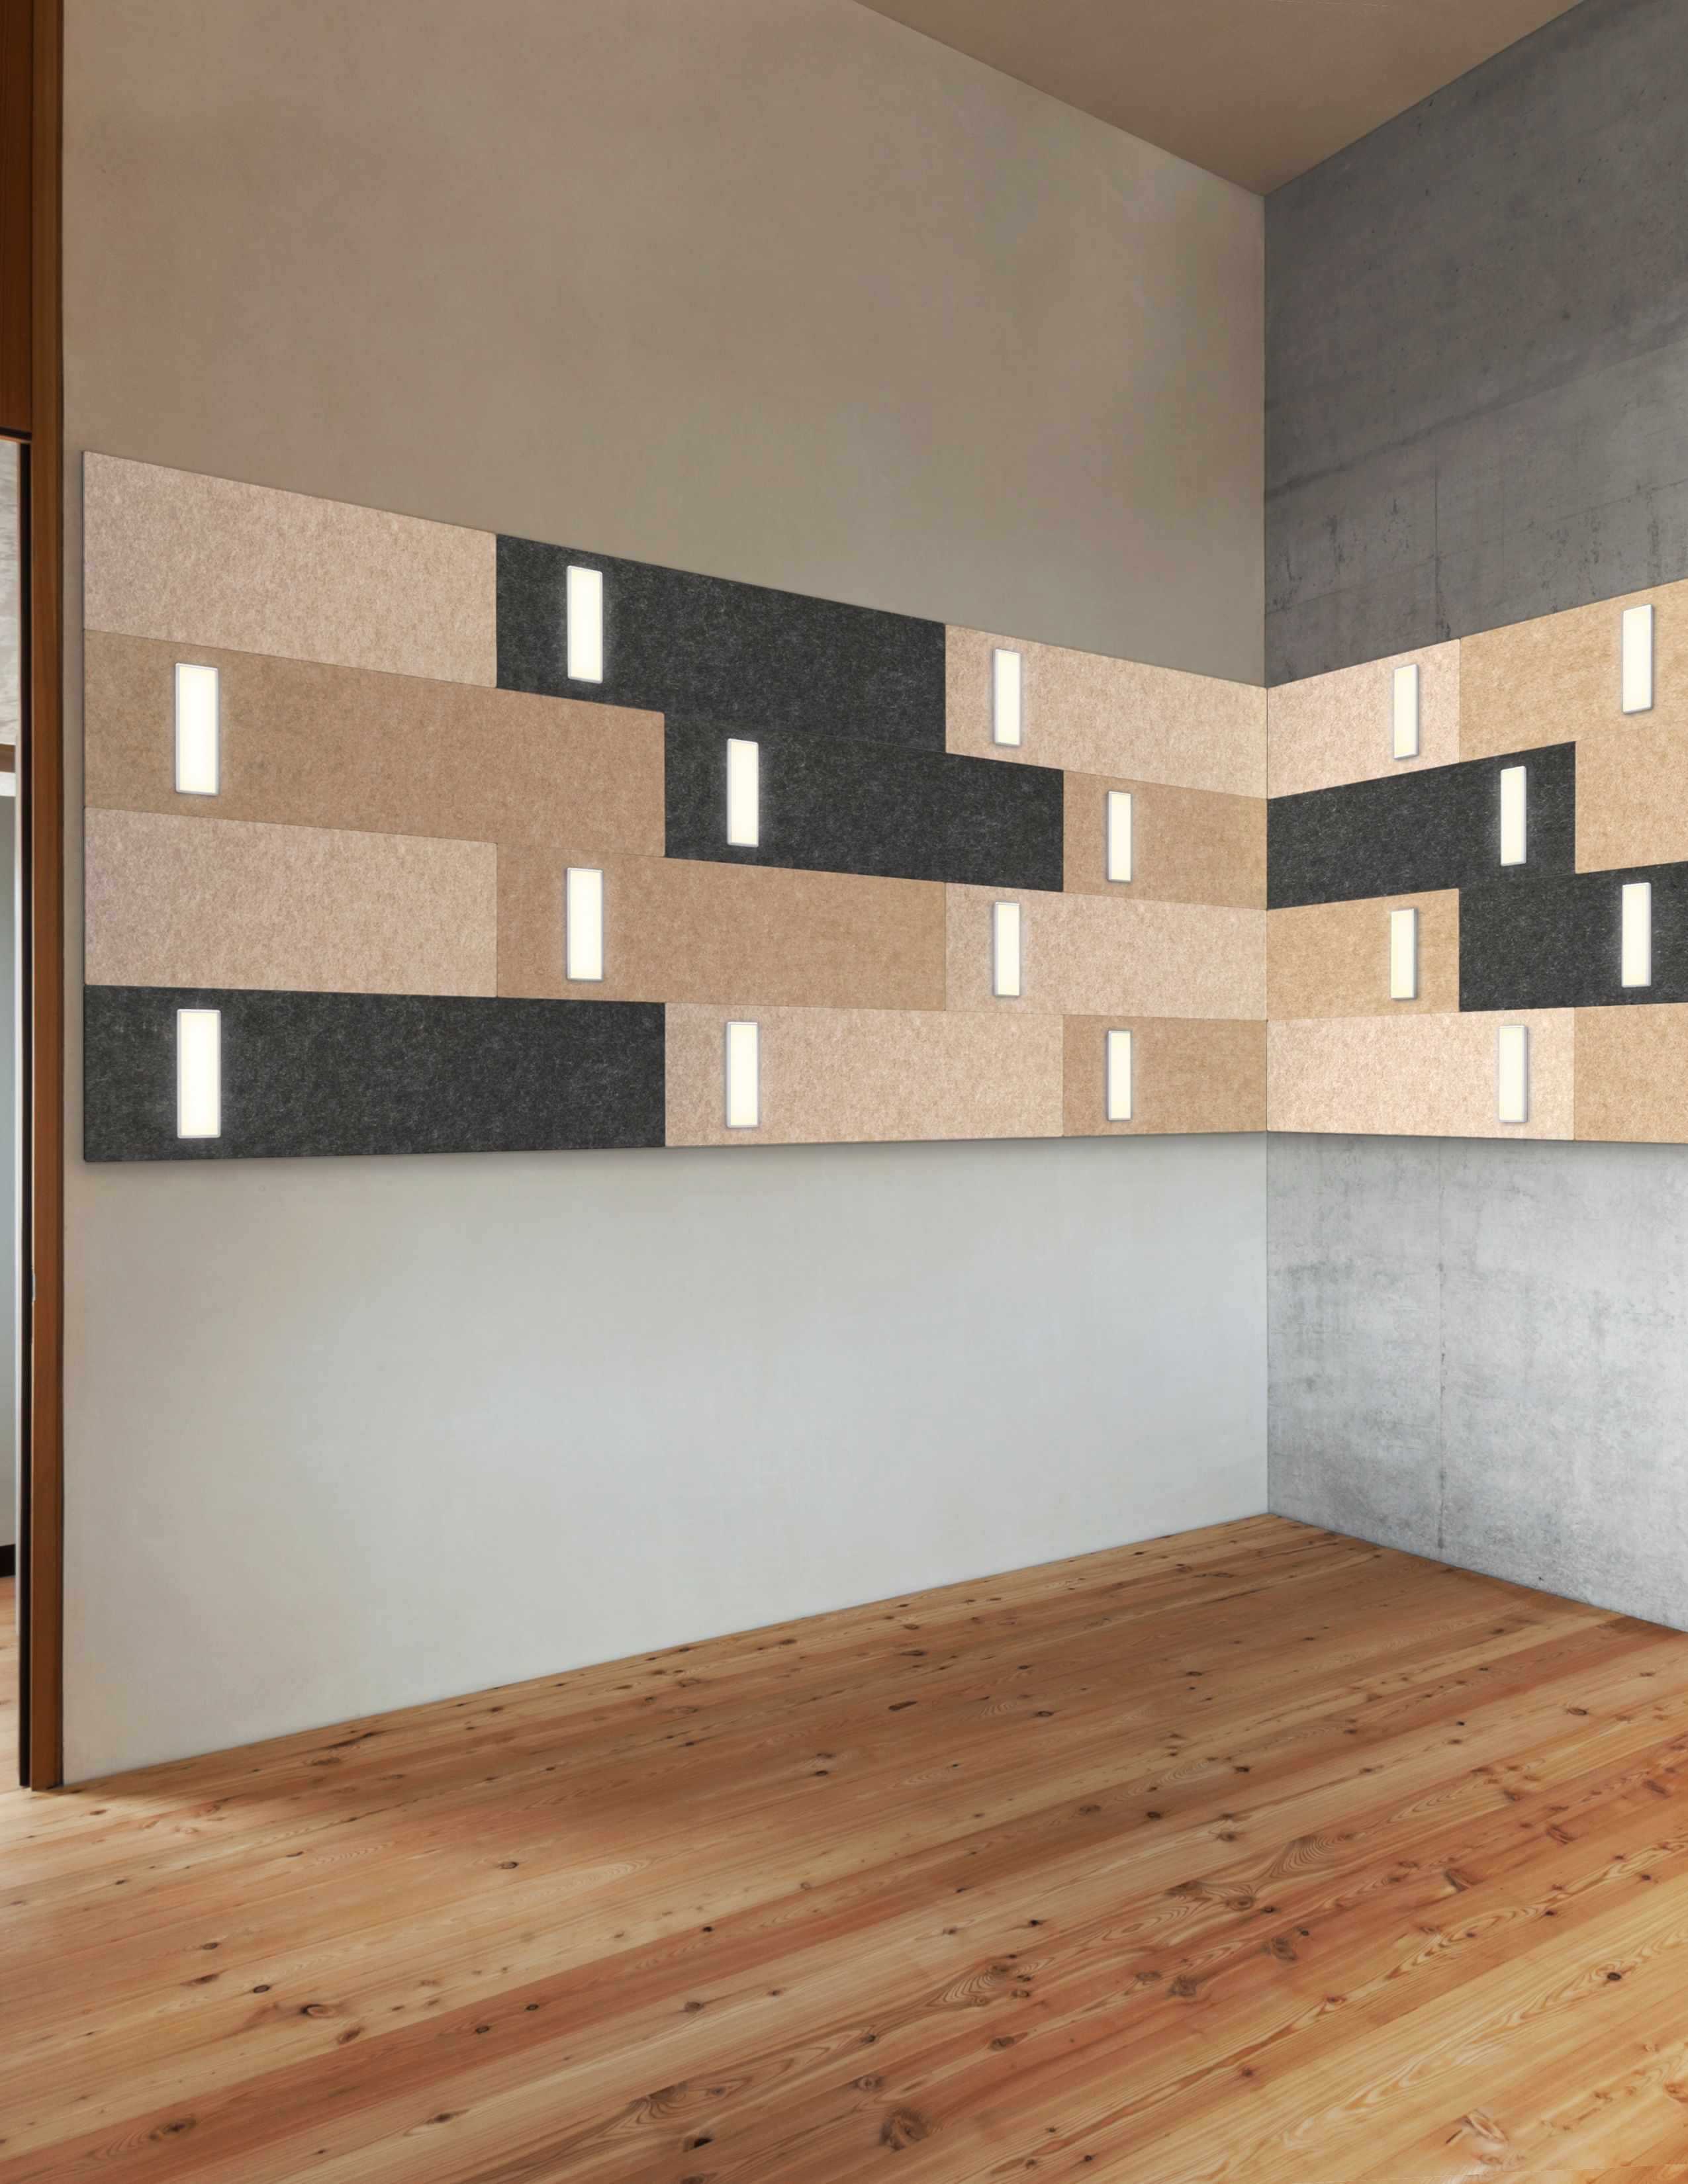 Matrix oled acoustic material eureka lighting e mail amelia matrix oled acoustic material eureka lighting e mail amelia arubaitofo Images